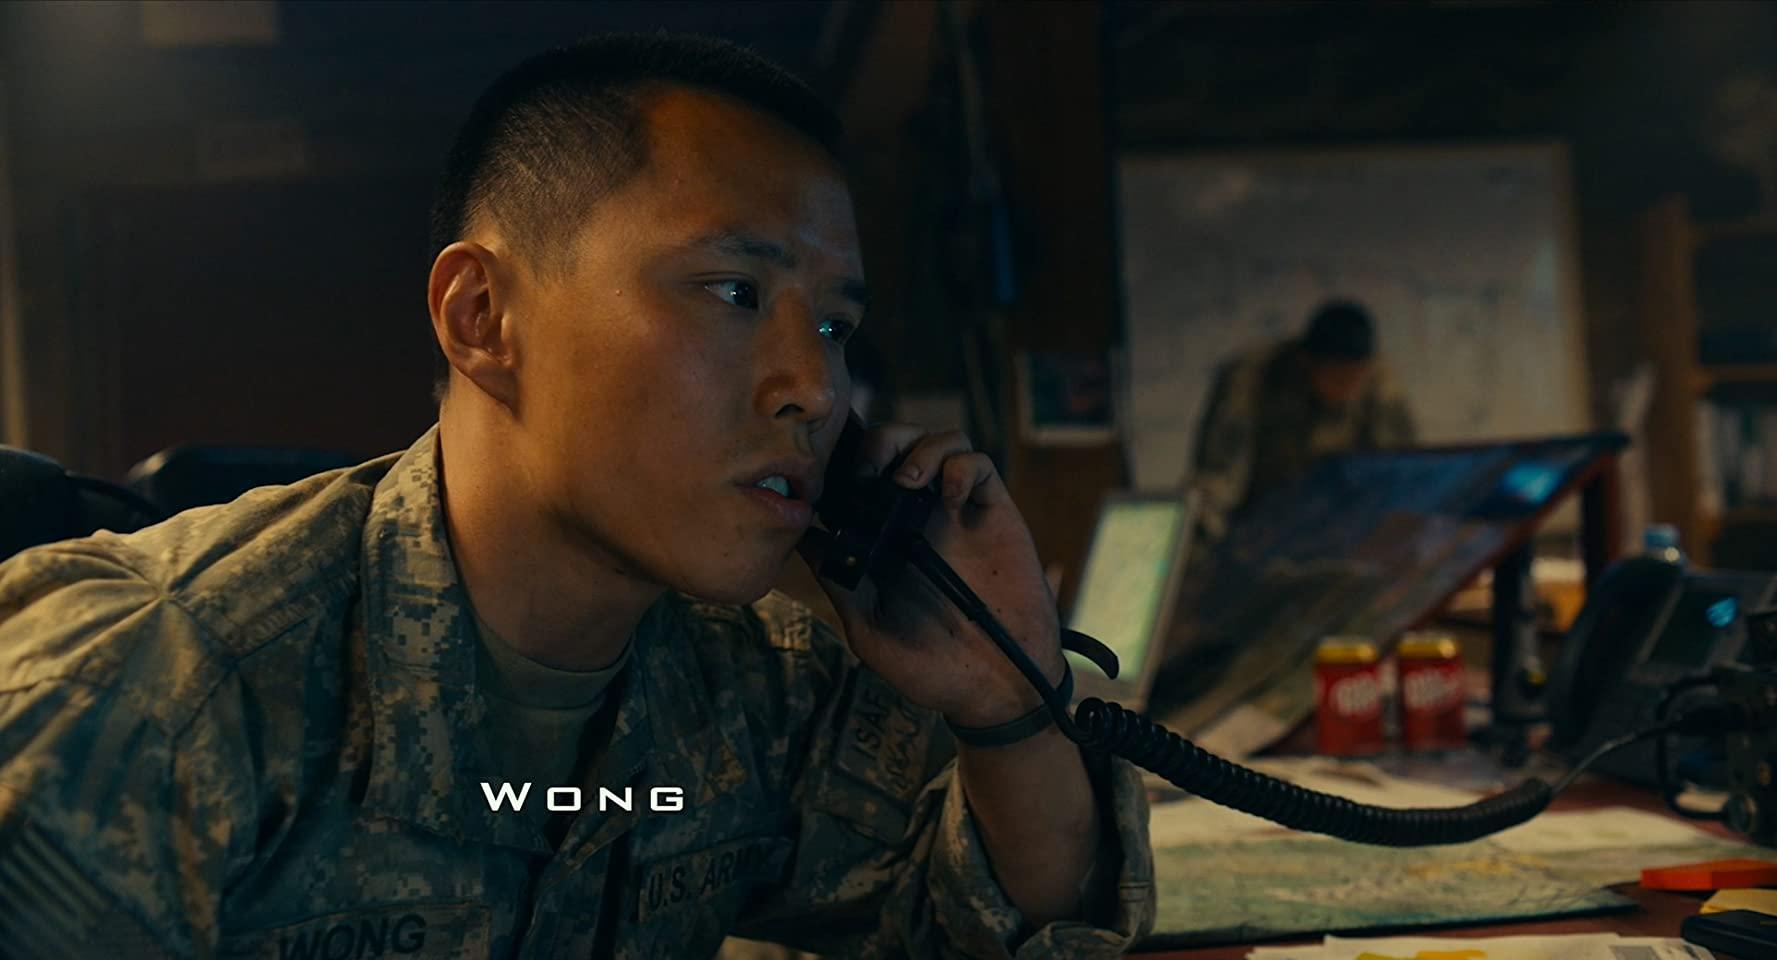 مشاهدة فيلم The Outpost (2020) مترجم HD اون لاين